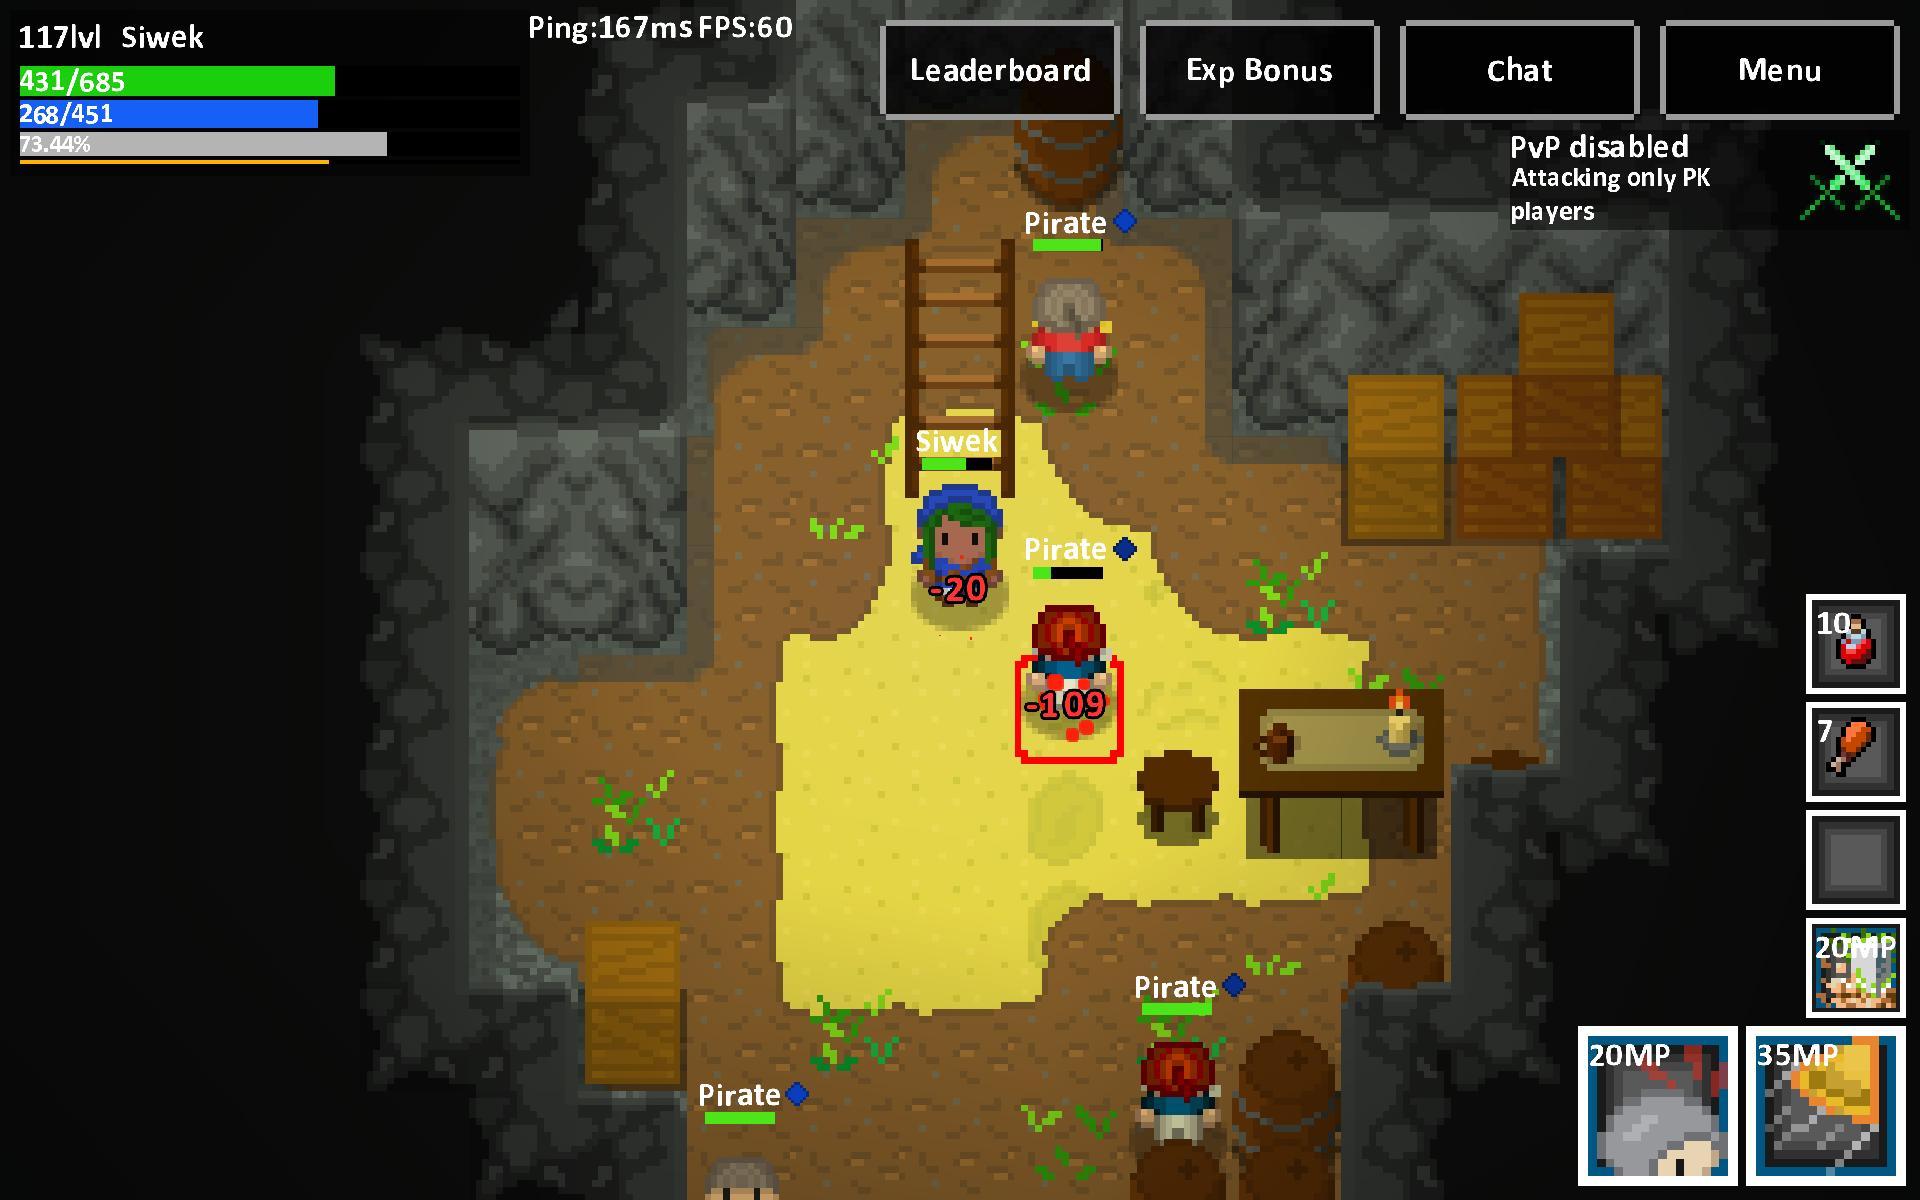 Heroes & Rats MMORPG Online 0.32.2 Screenshot 5